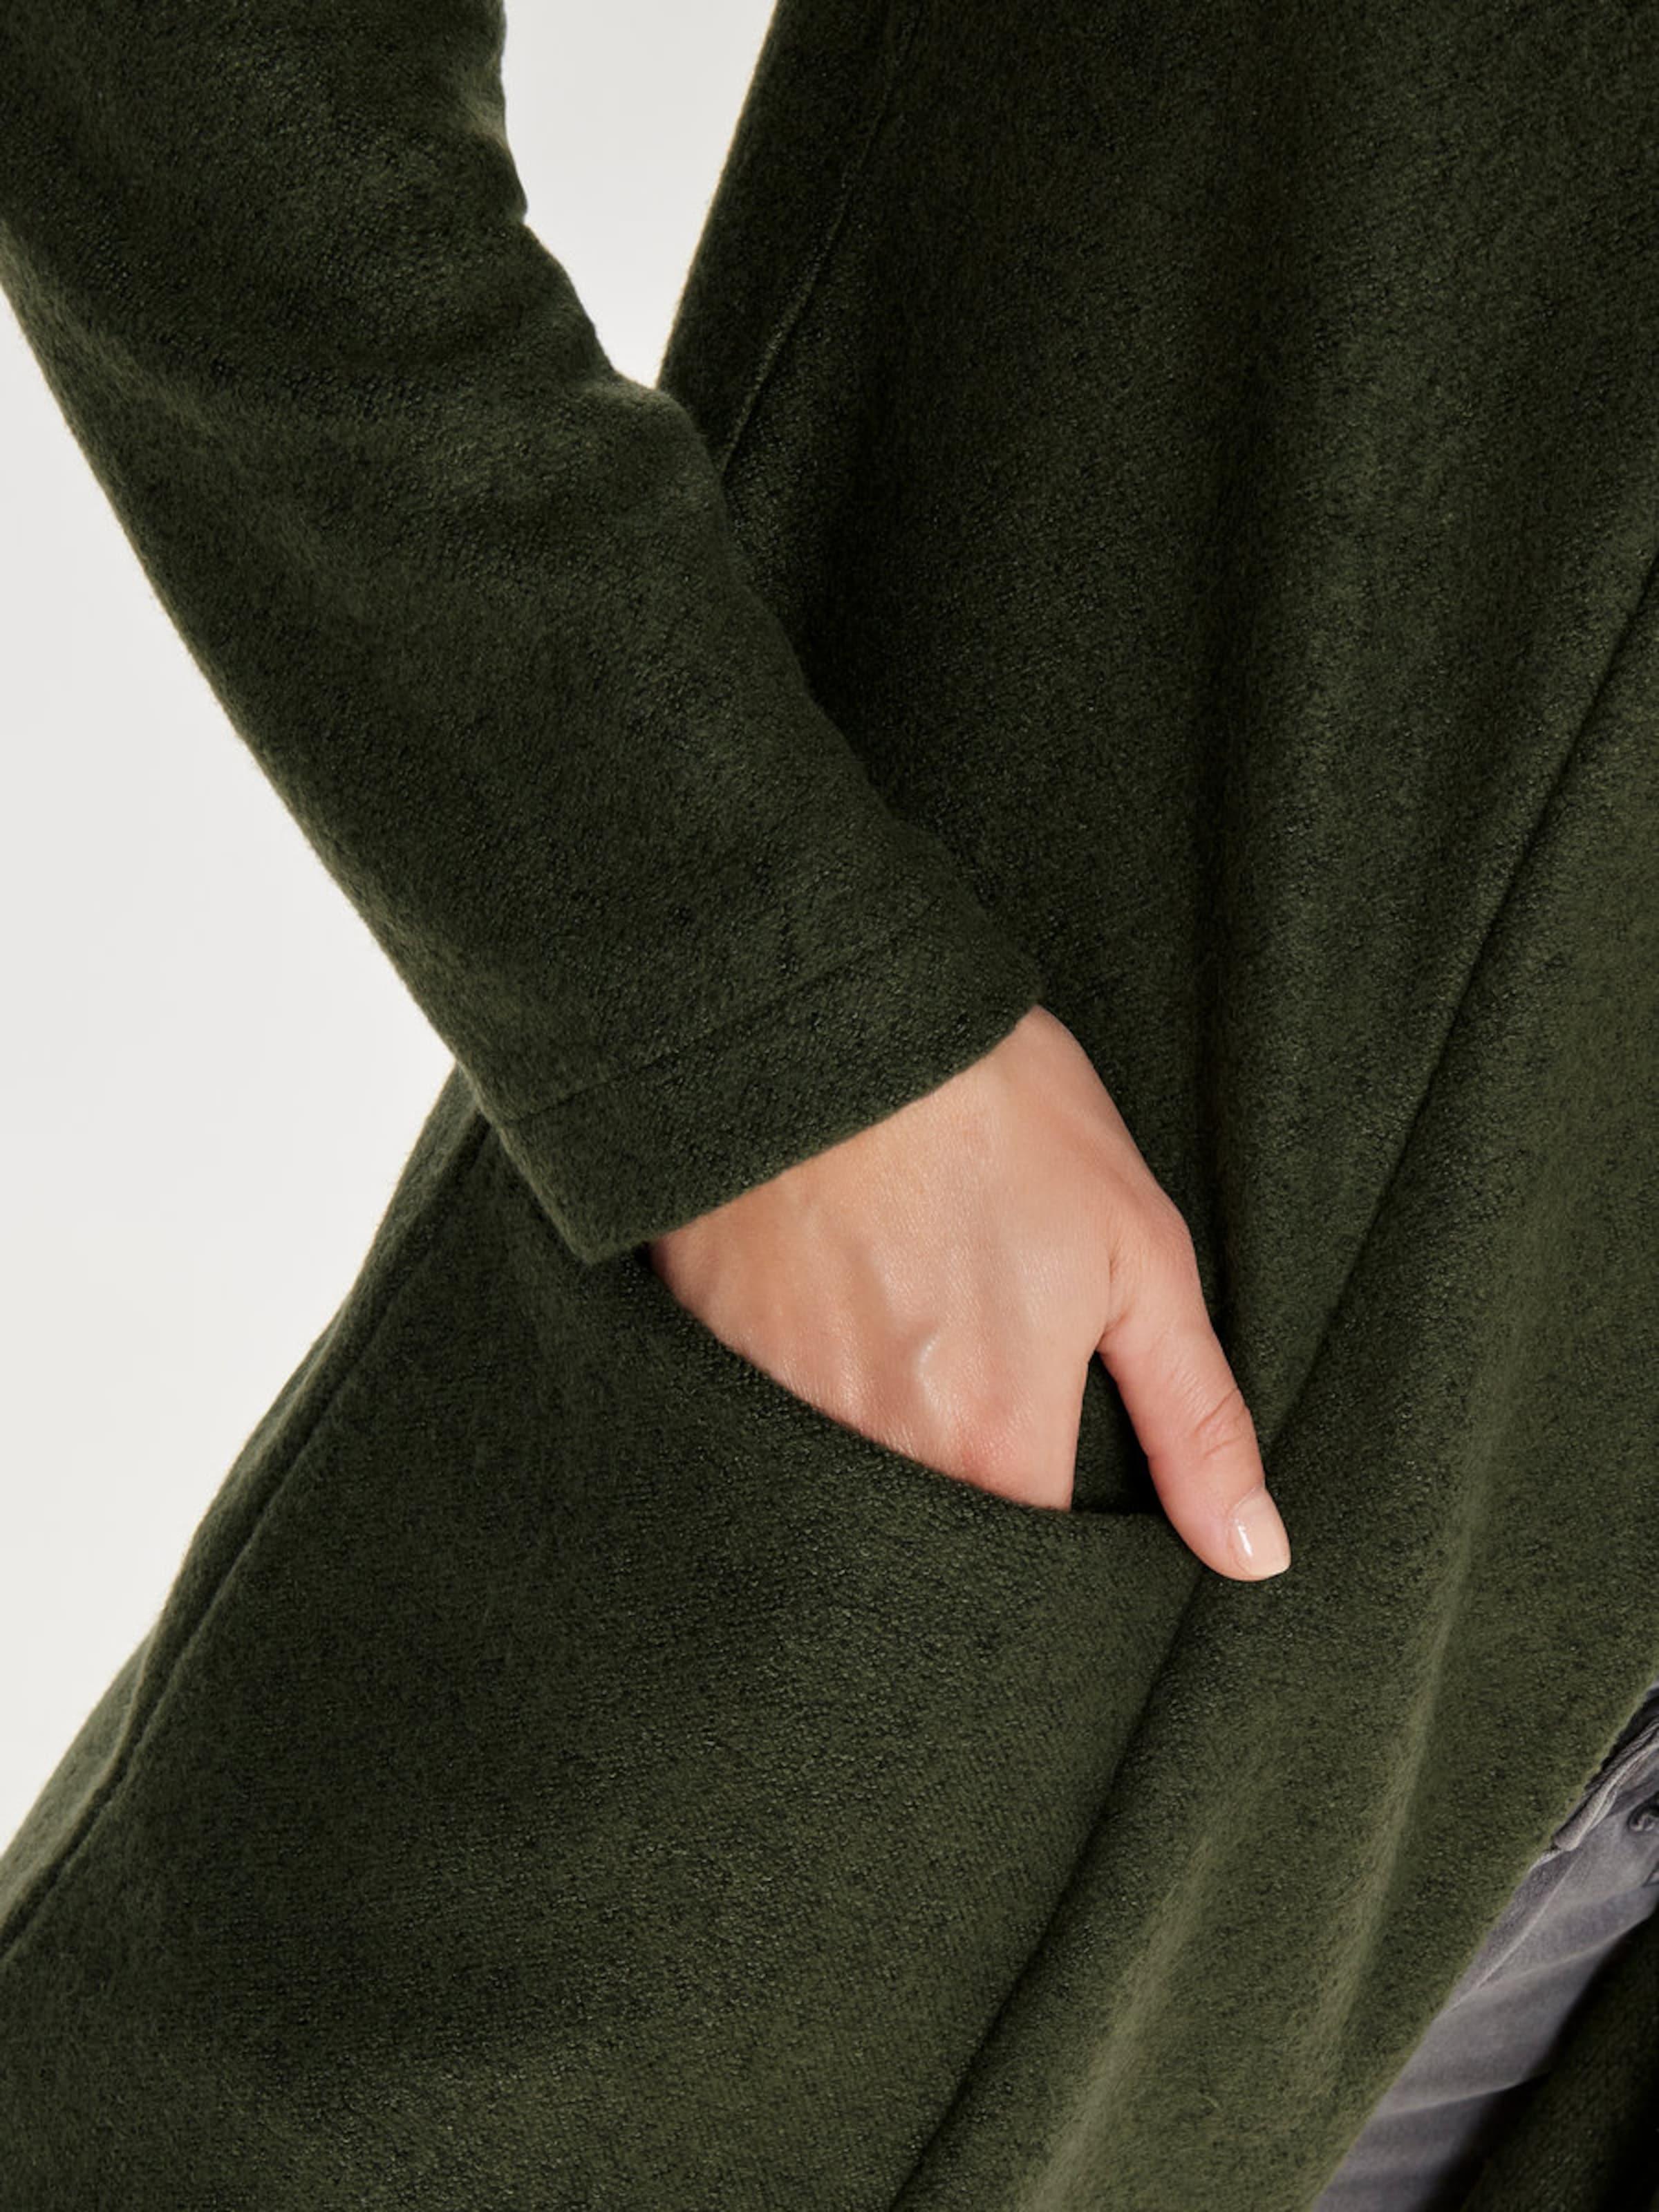 Gebreid De Groen Yong Vest Jacqueline 'evita' In f6gIYb7yv